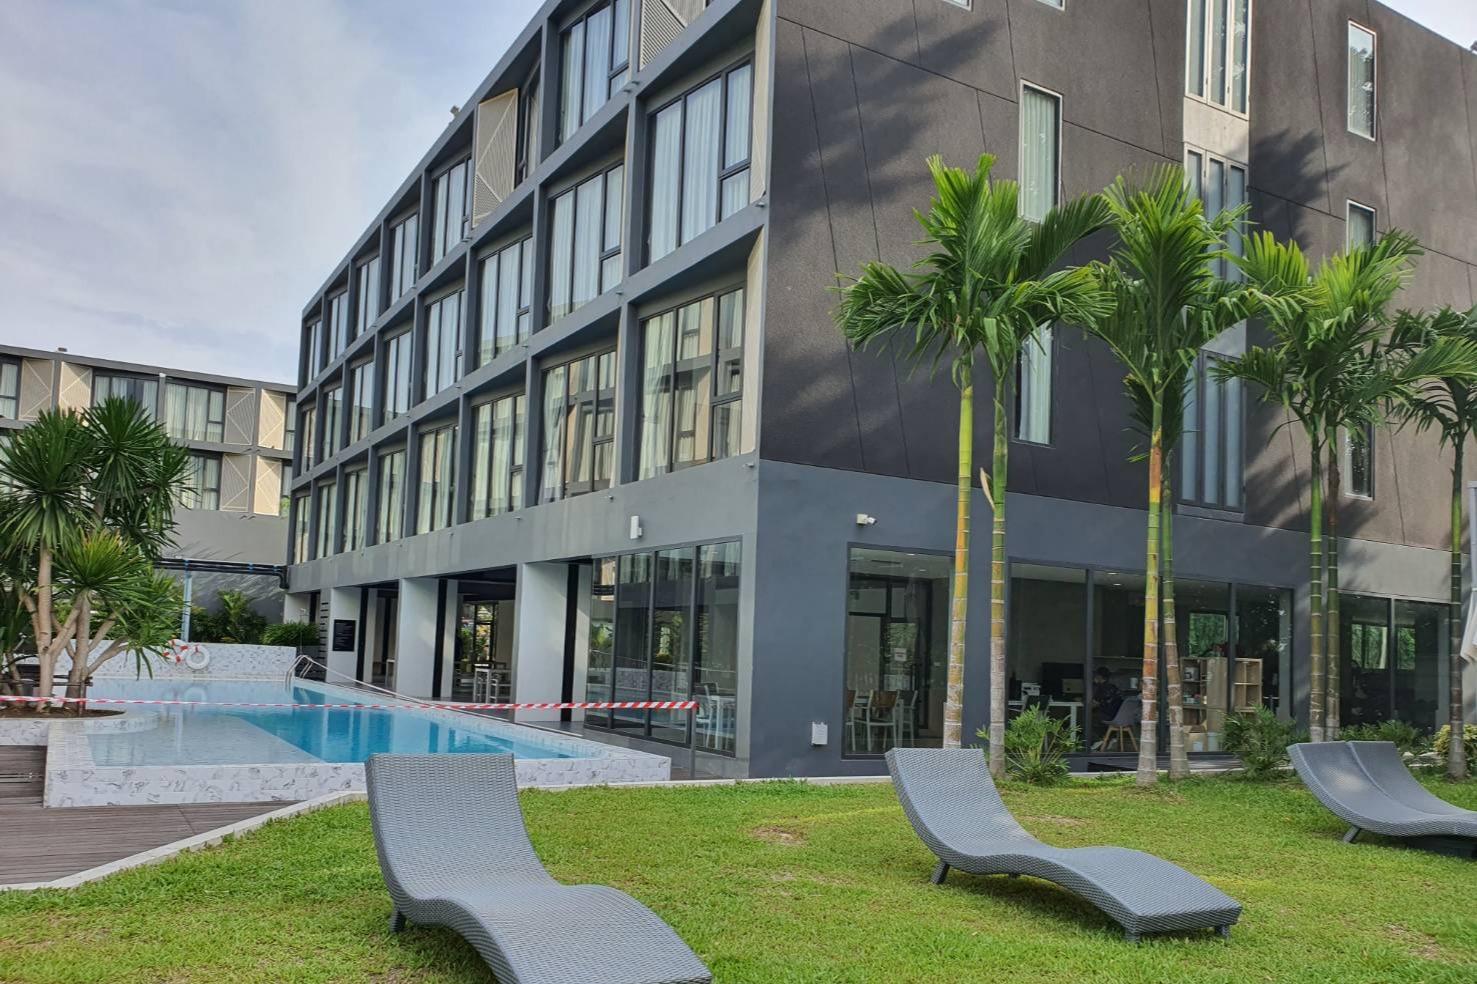 RNP Pool Hotel - Image 4